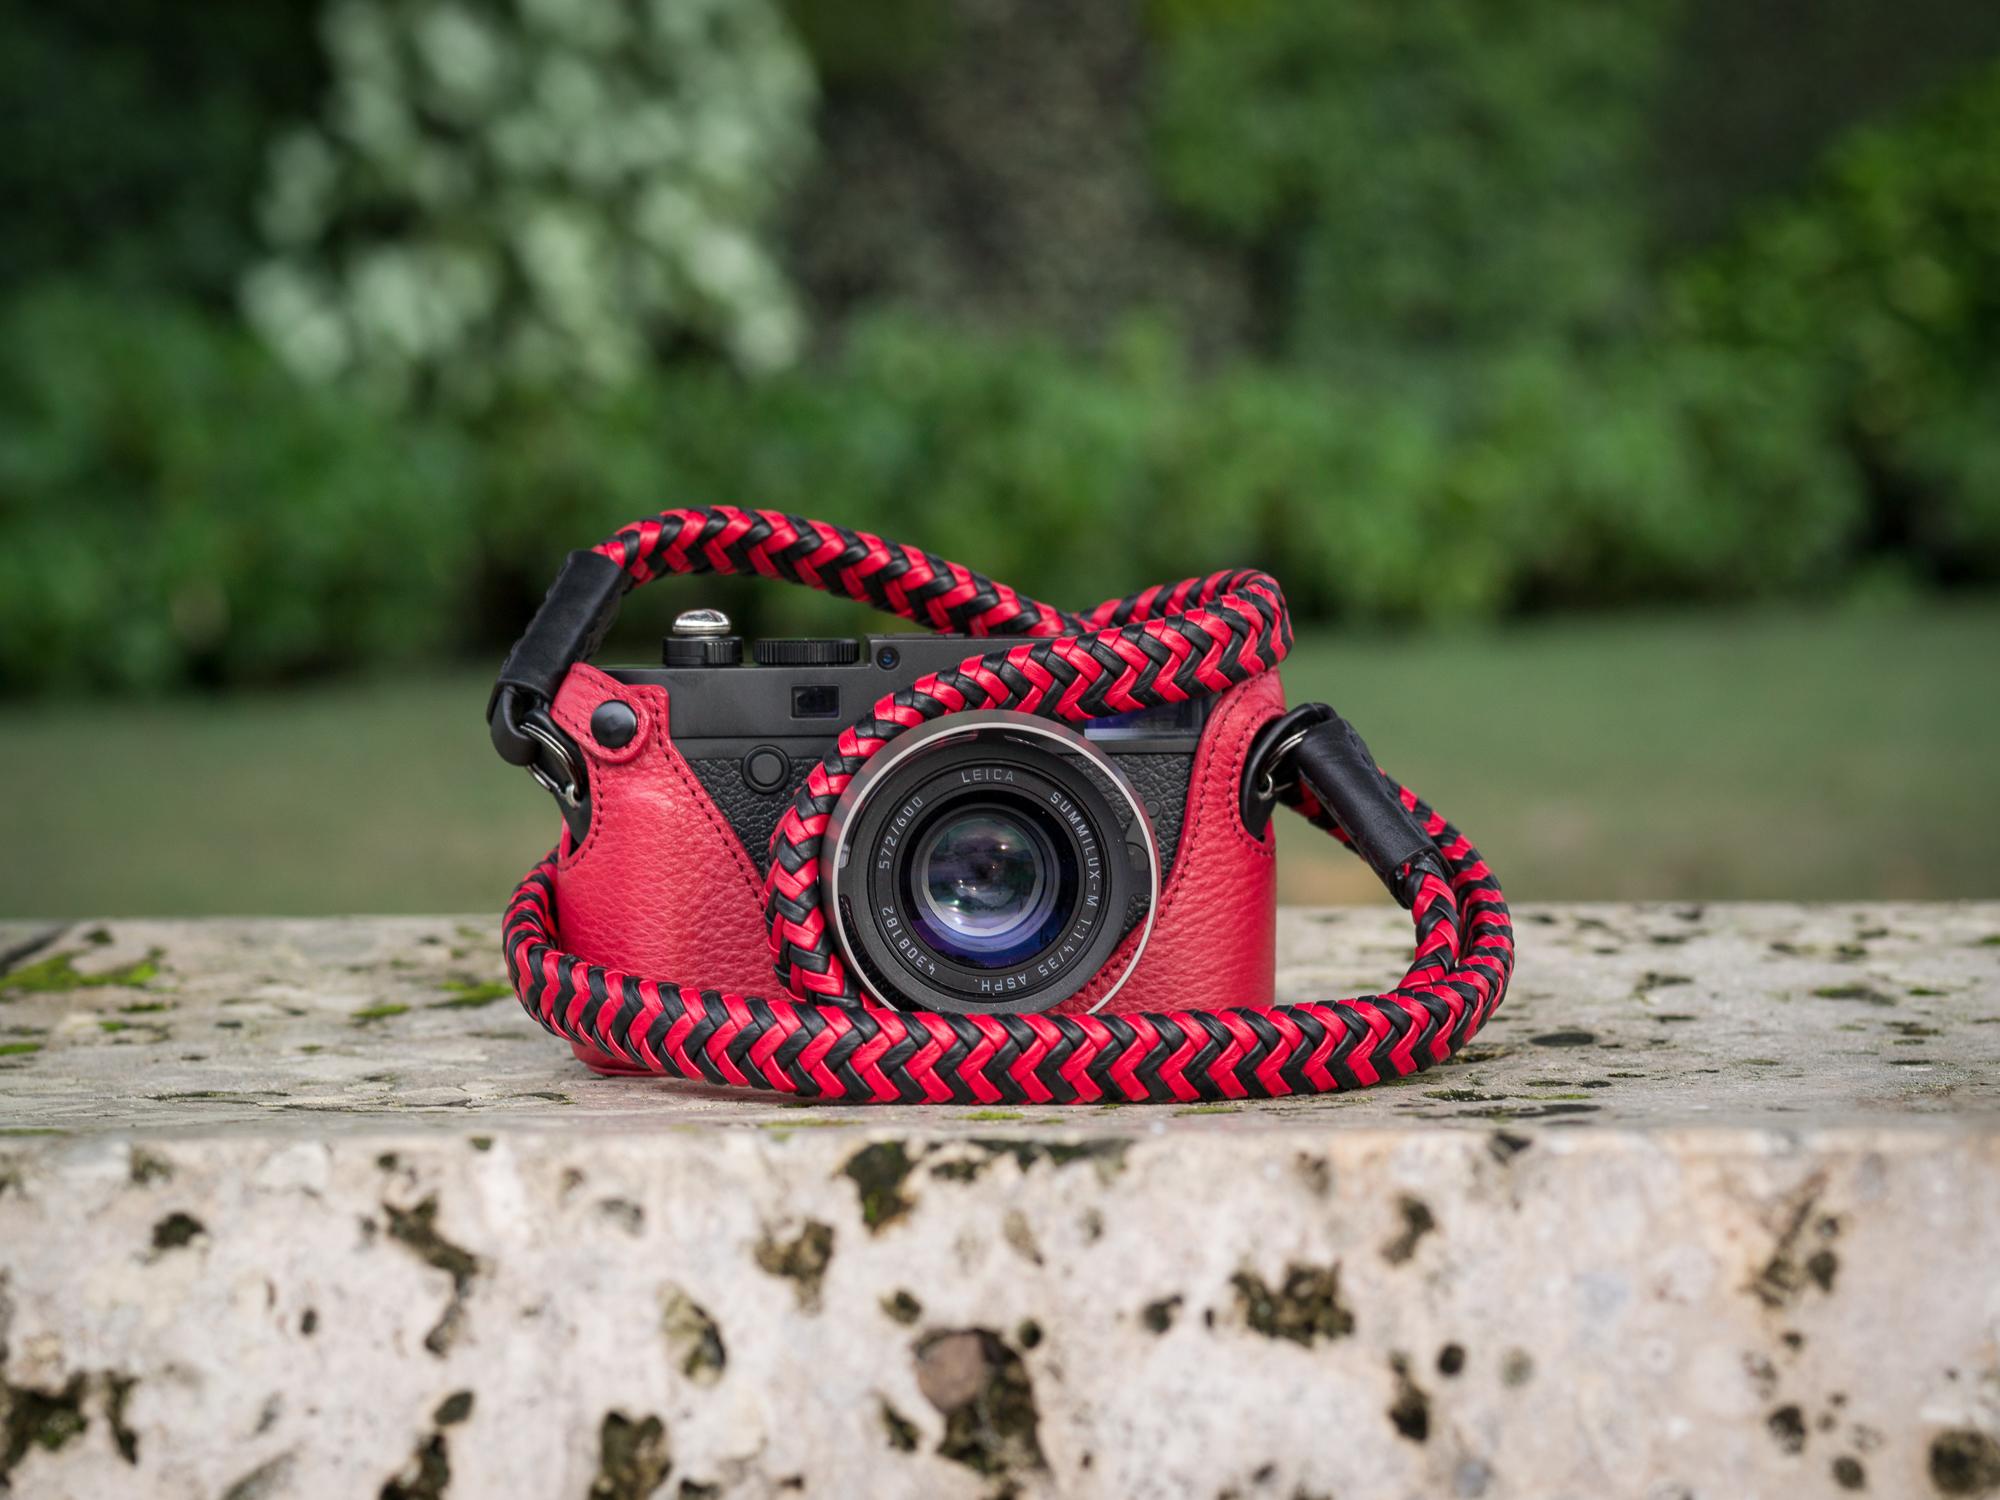 Vi Vante Matador phoenix braided leather camera strap leica m10.jpg